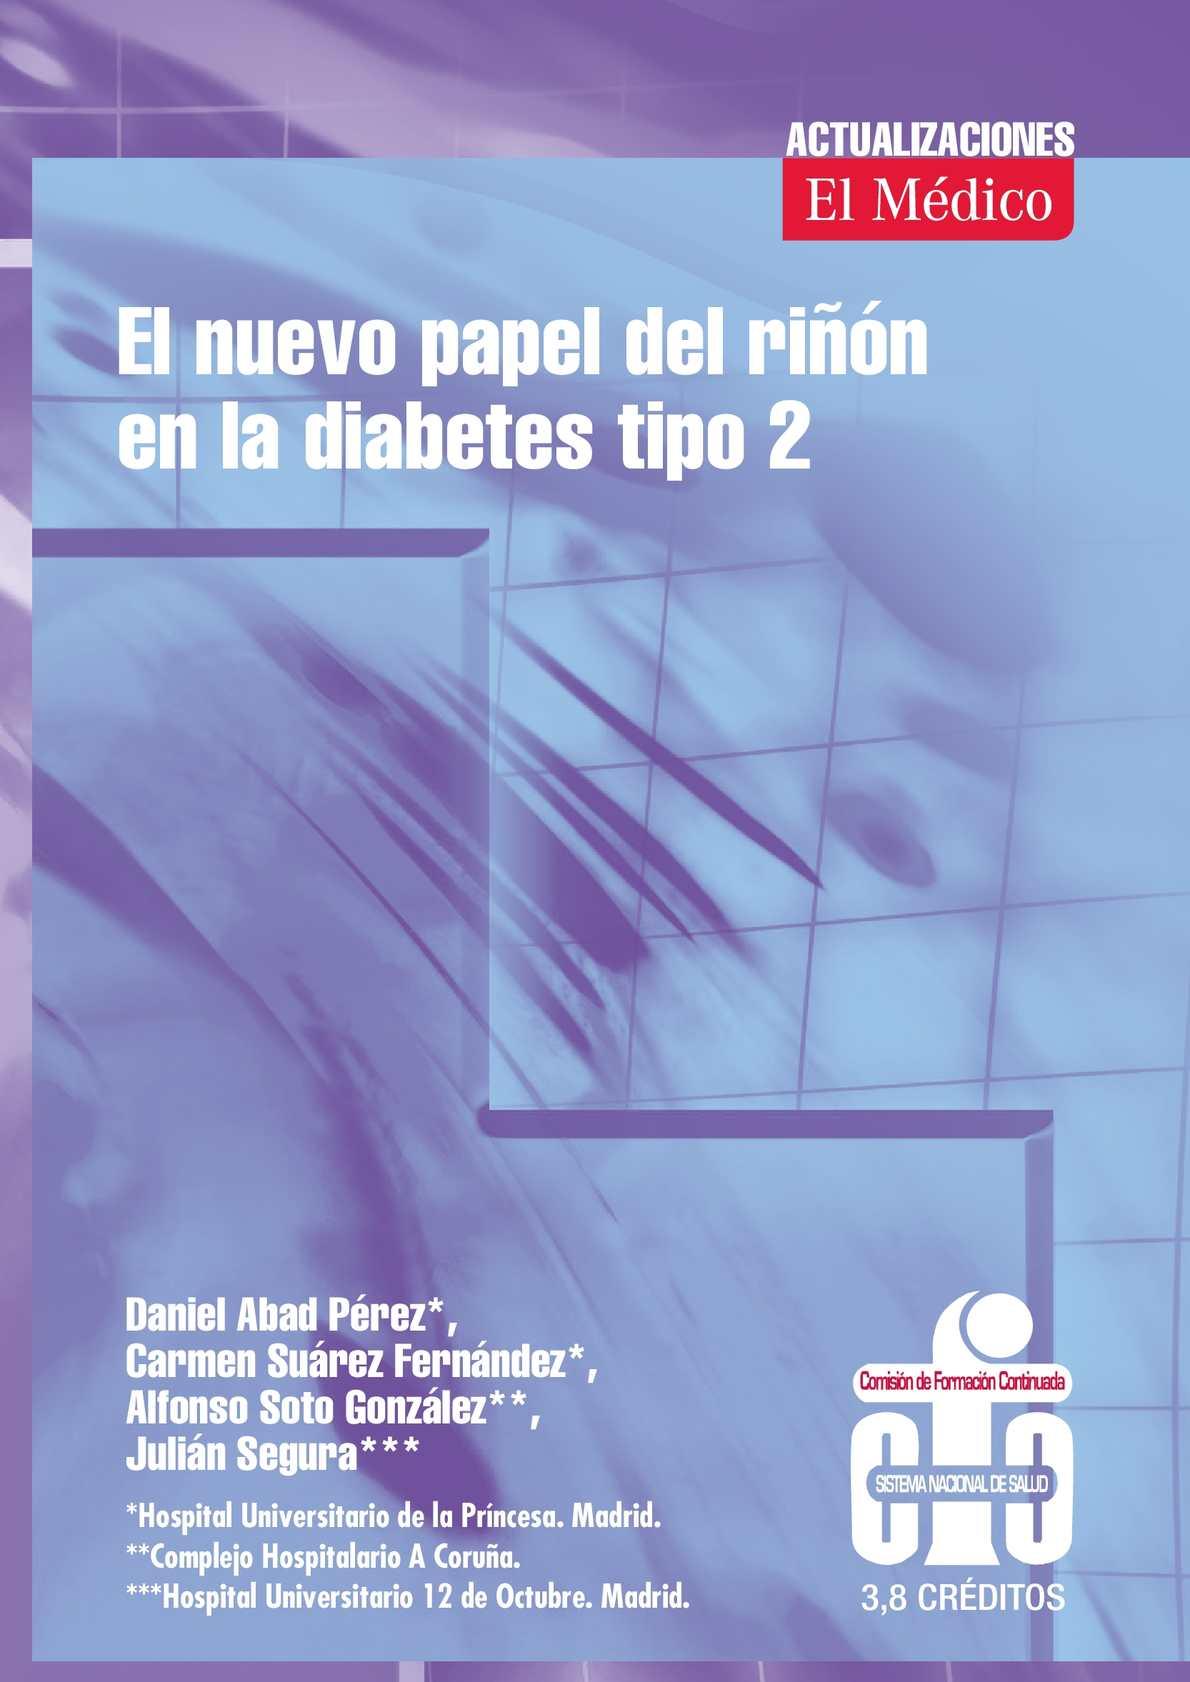 contribuyentes a la diabetes tipo 2